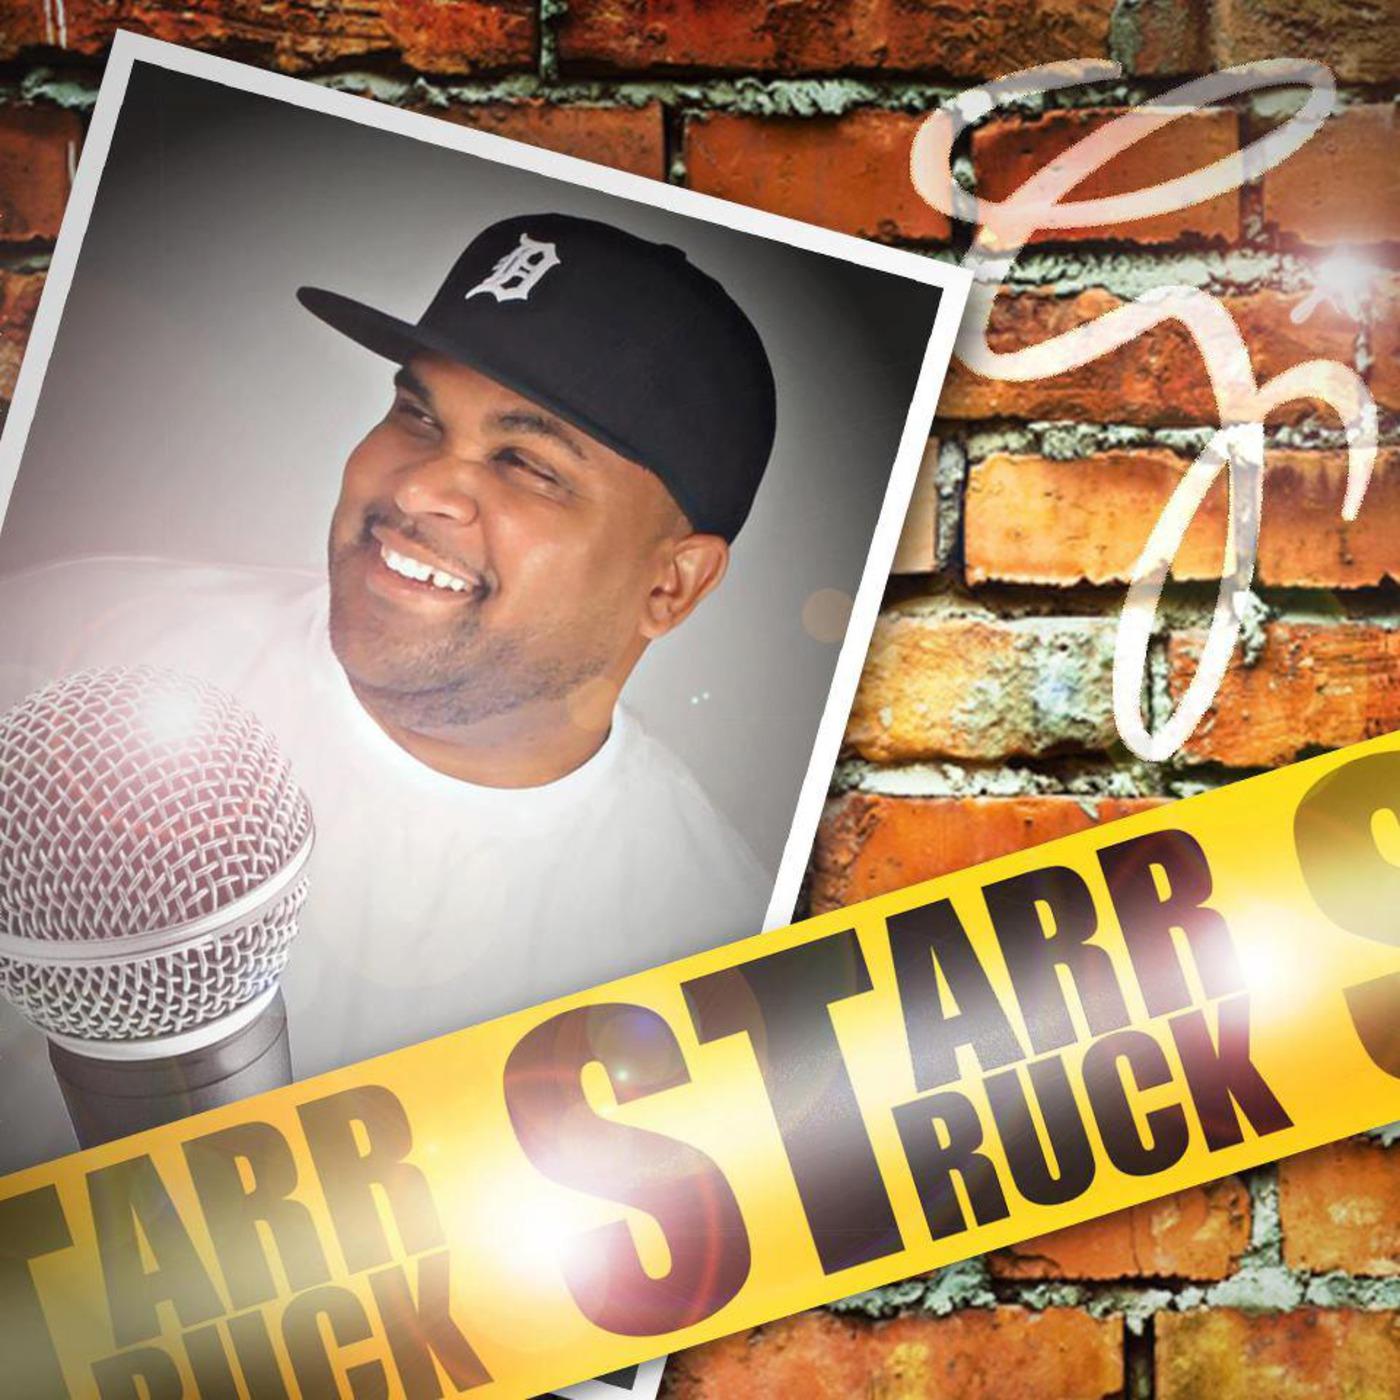 Starr Struck